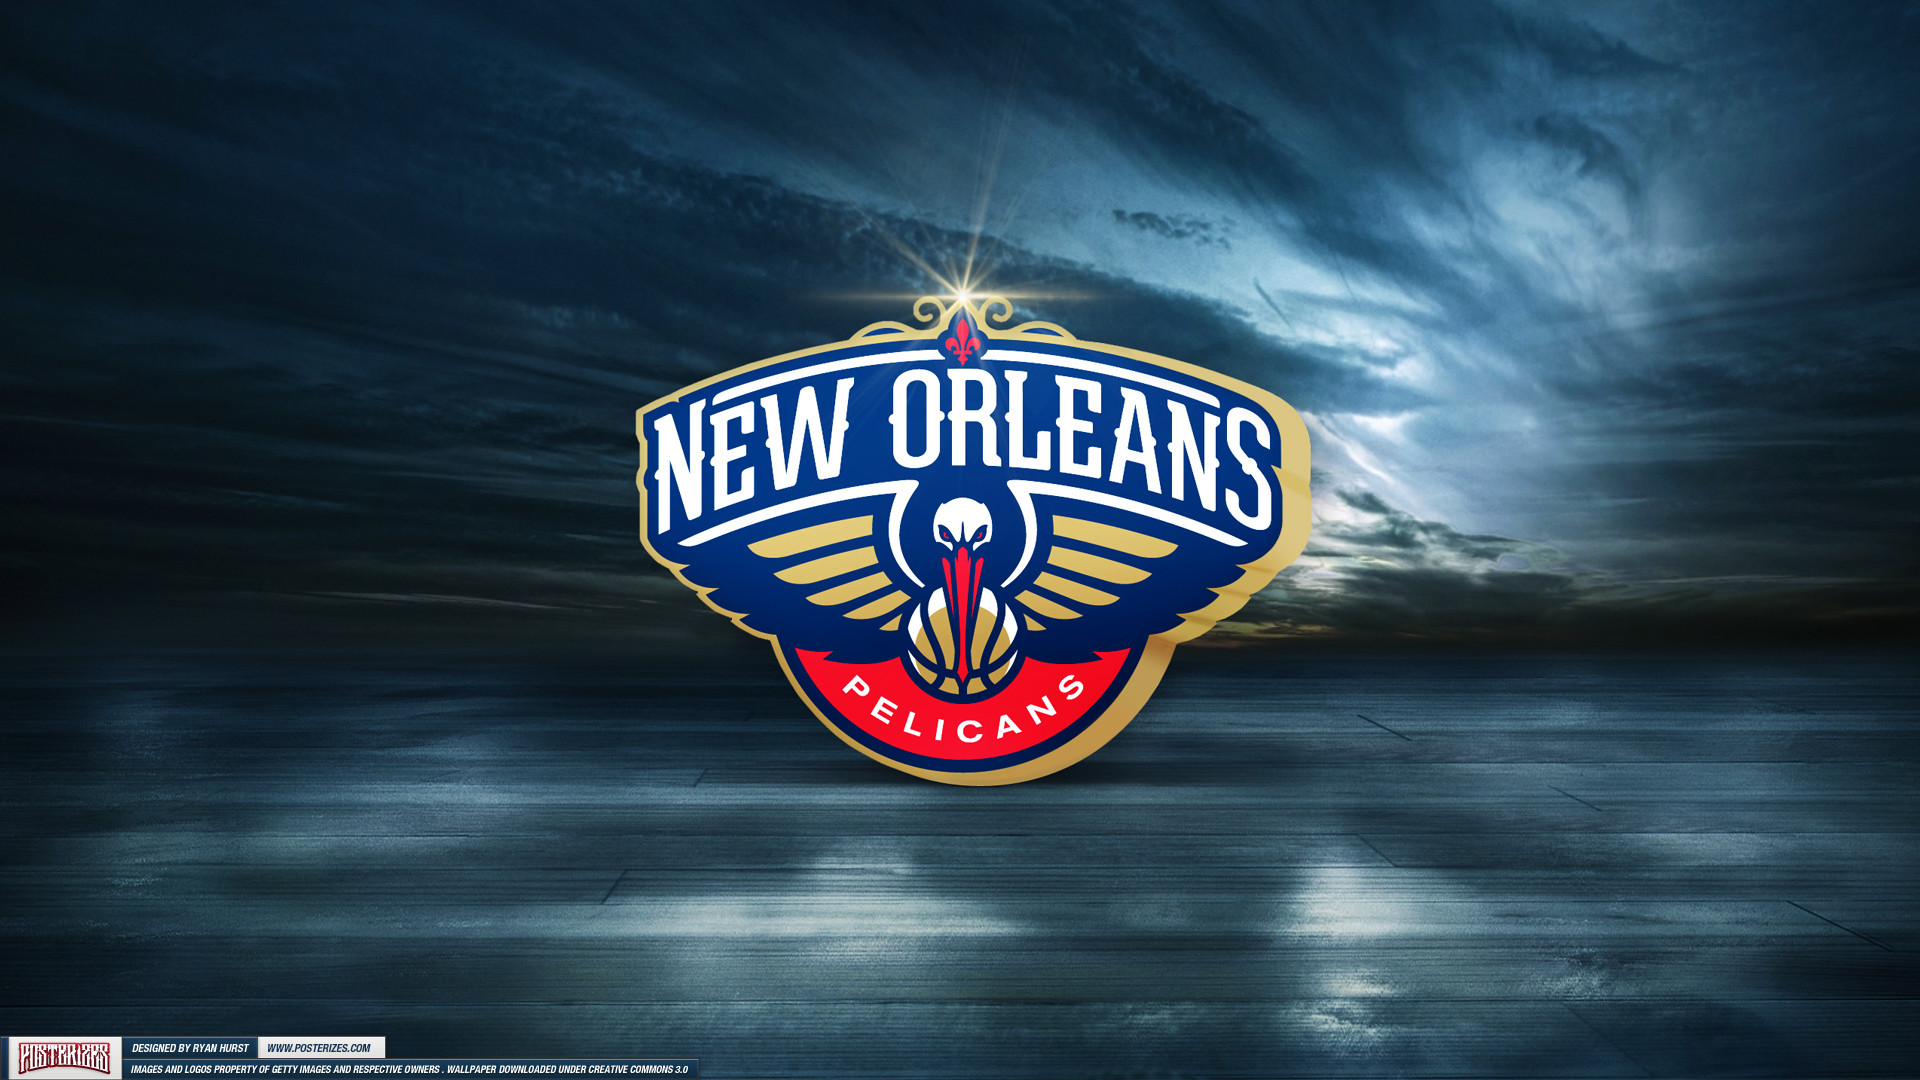 New Orleans Pelicans Wallpaper #1 | New Orleans Hornets/Pelicans |  Pinterest | NBA